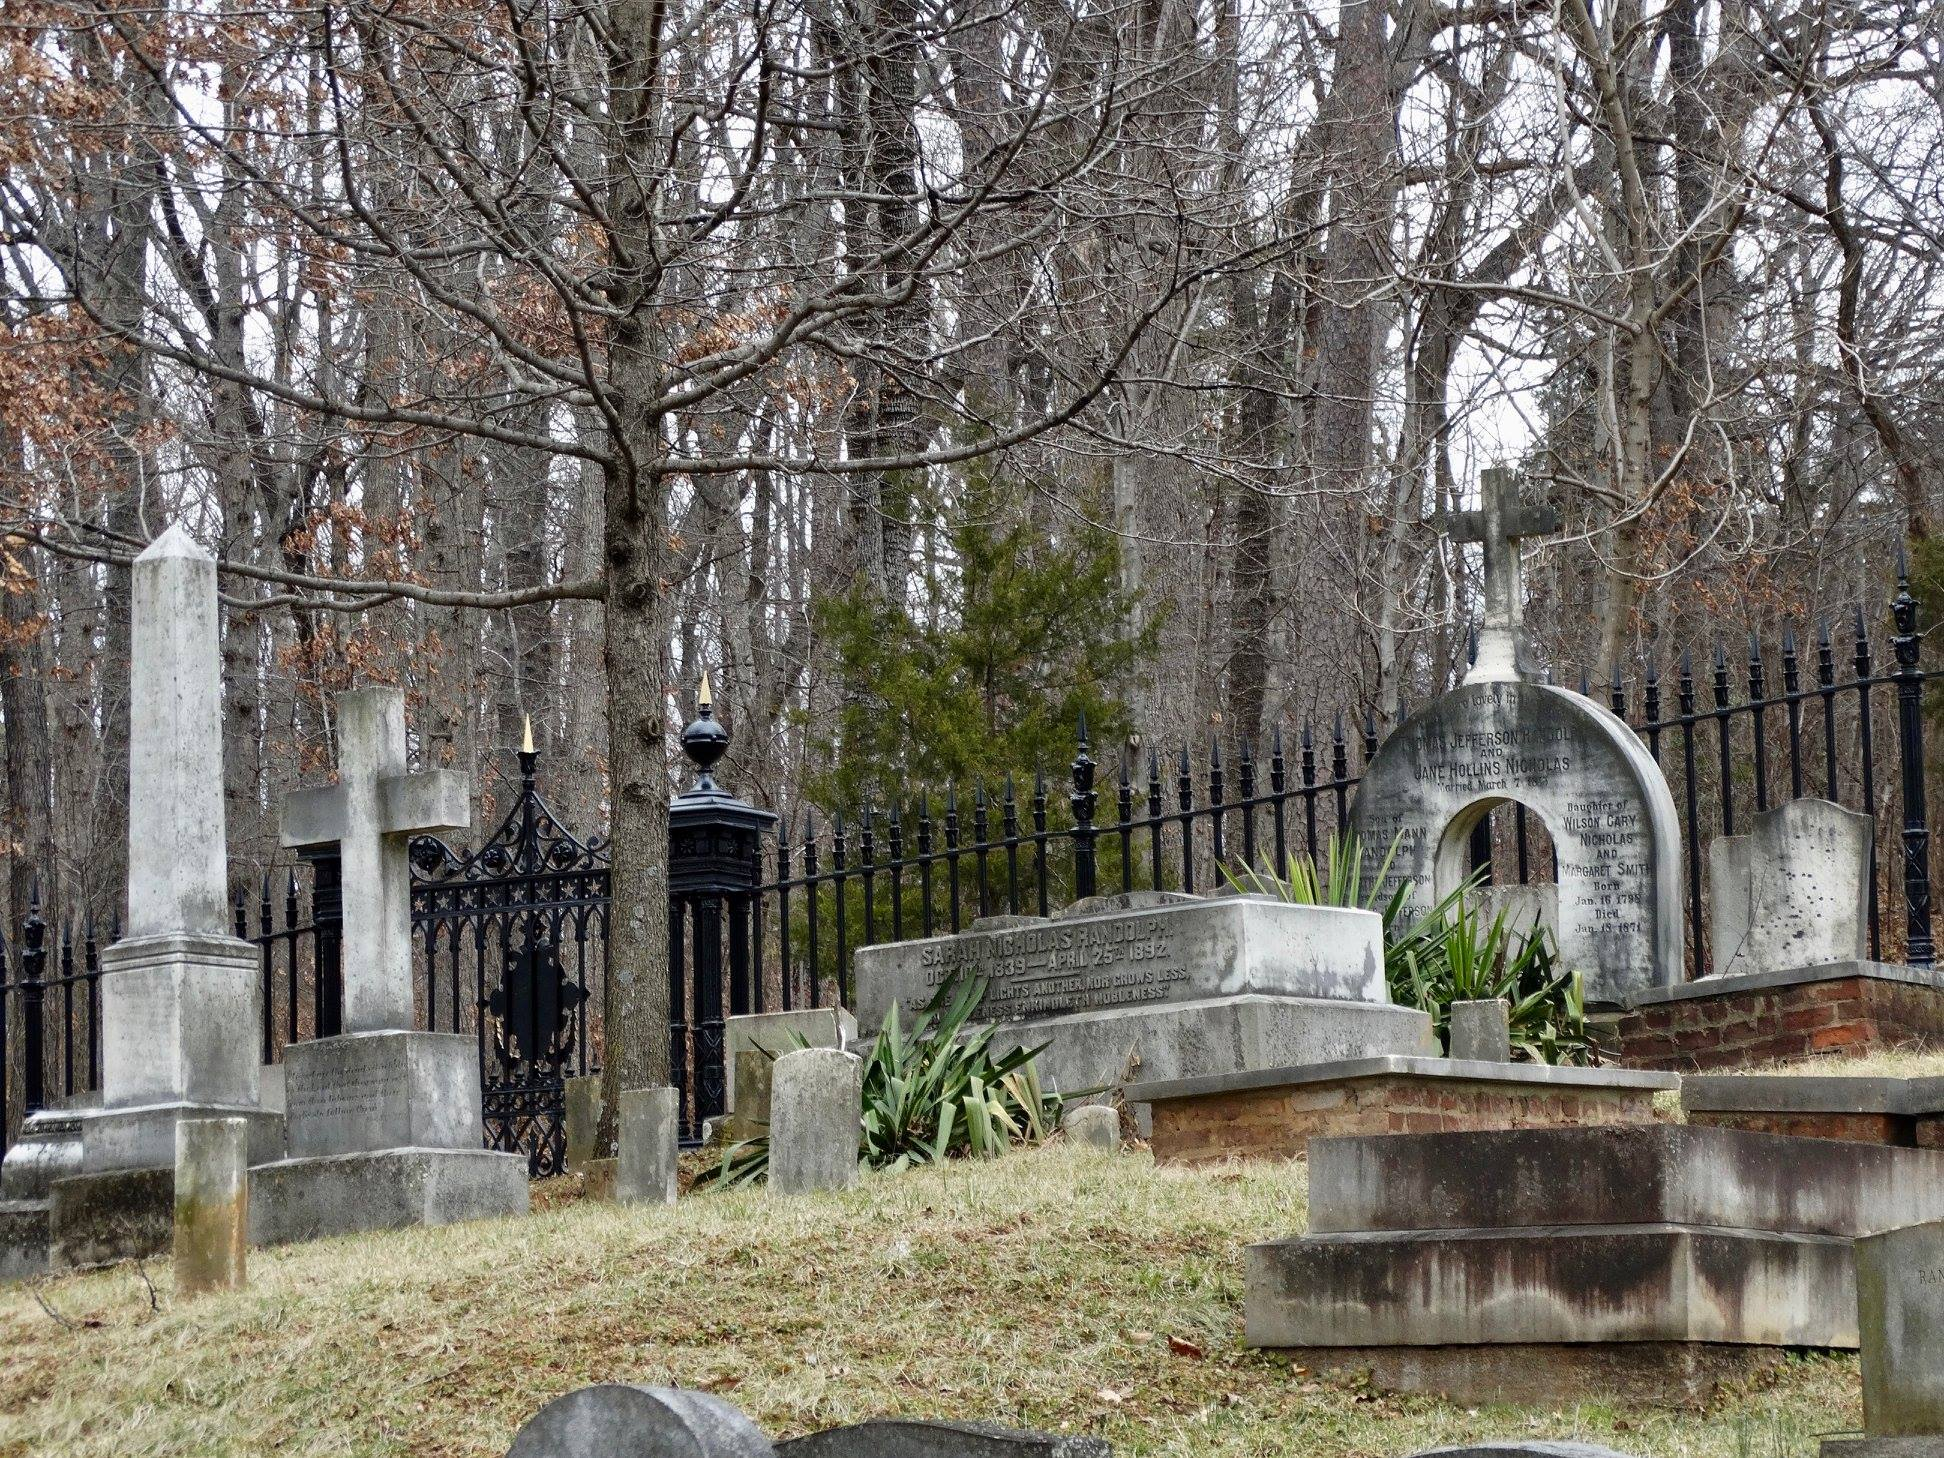 Monticello's graveyard, where Thomas Jefferson and his direct descendants lie in rest.